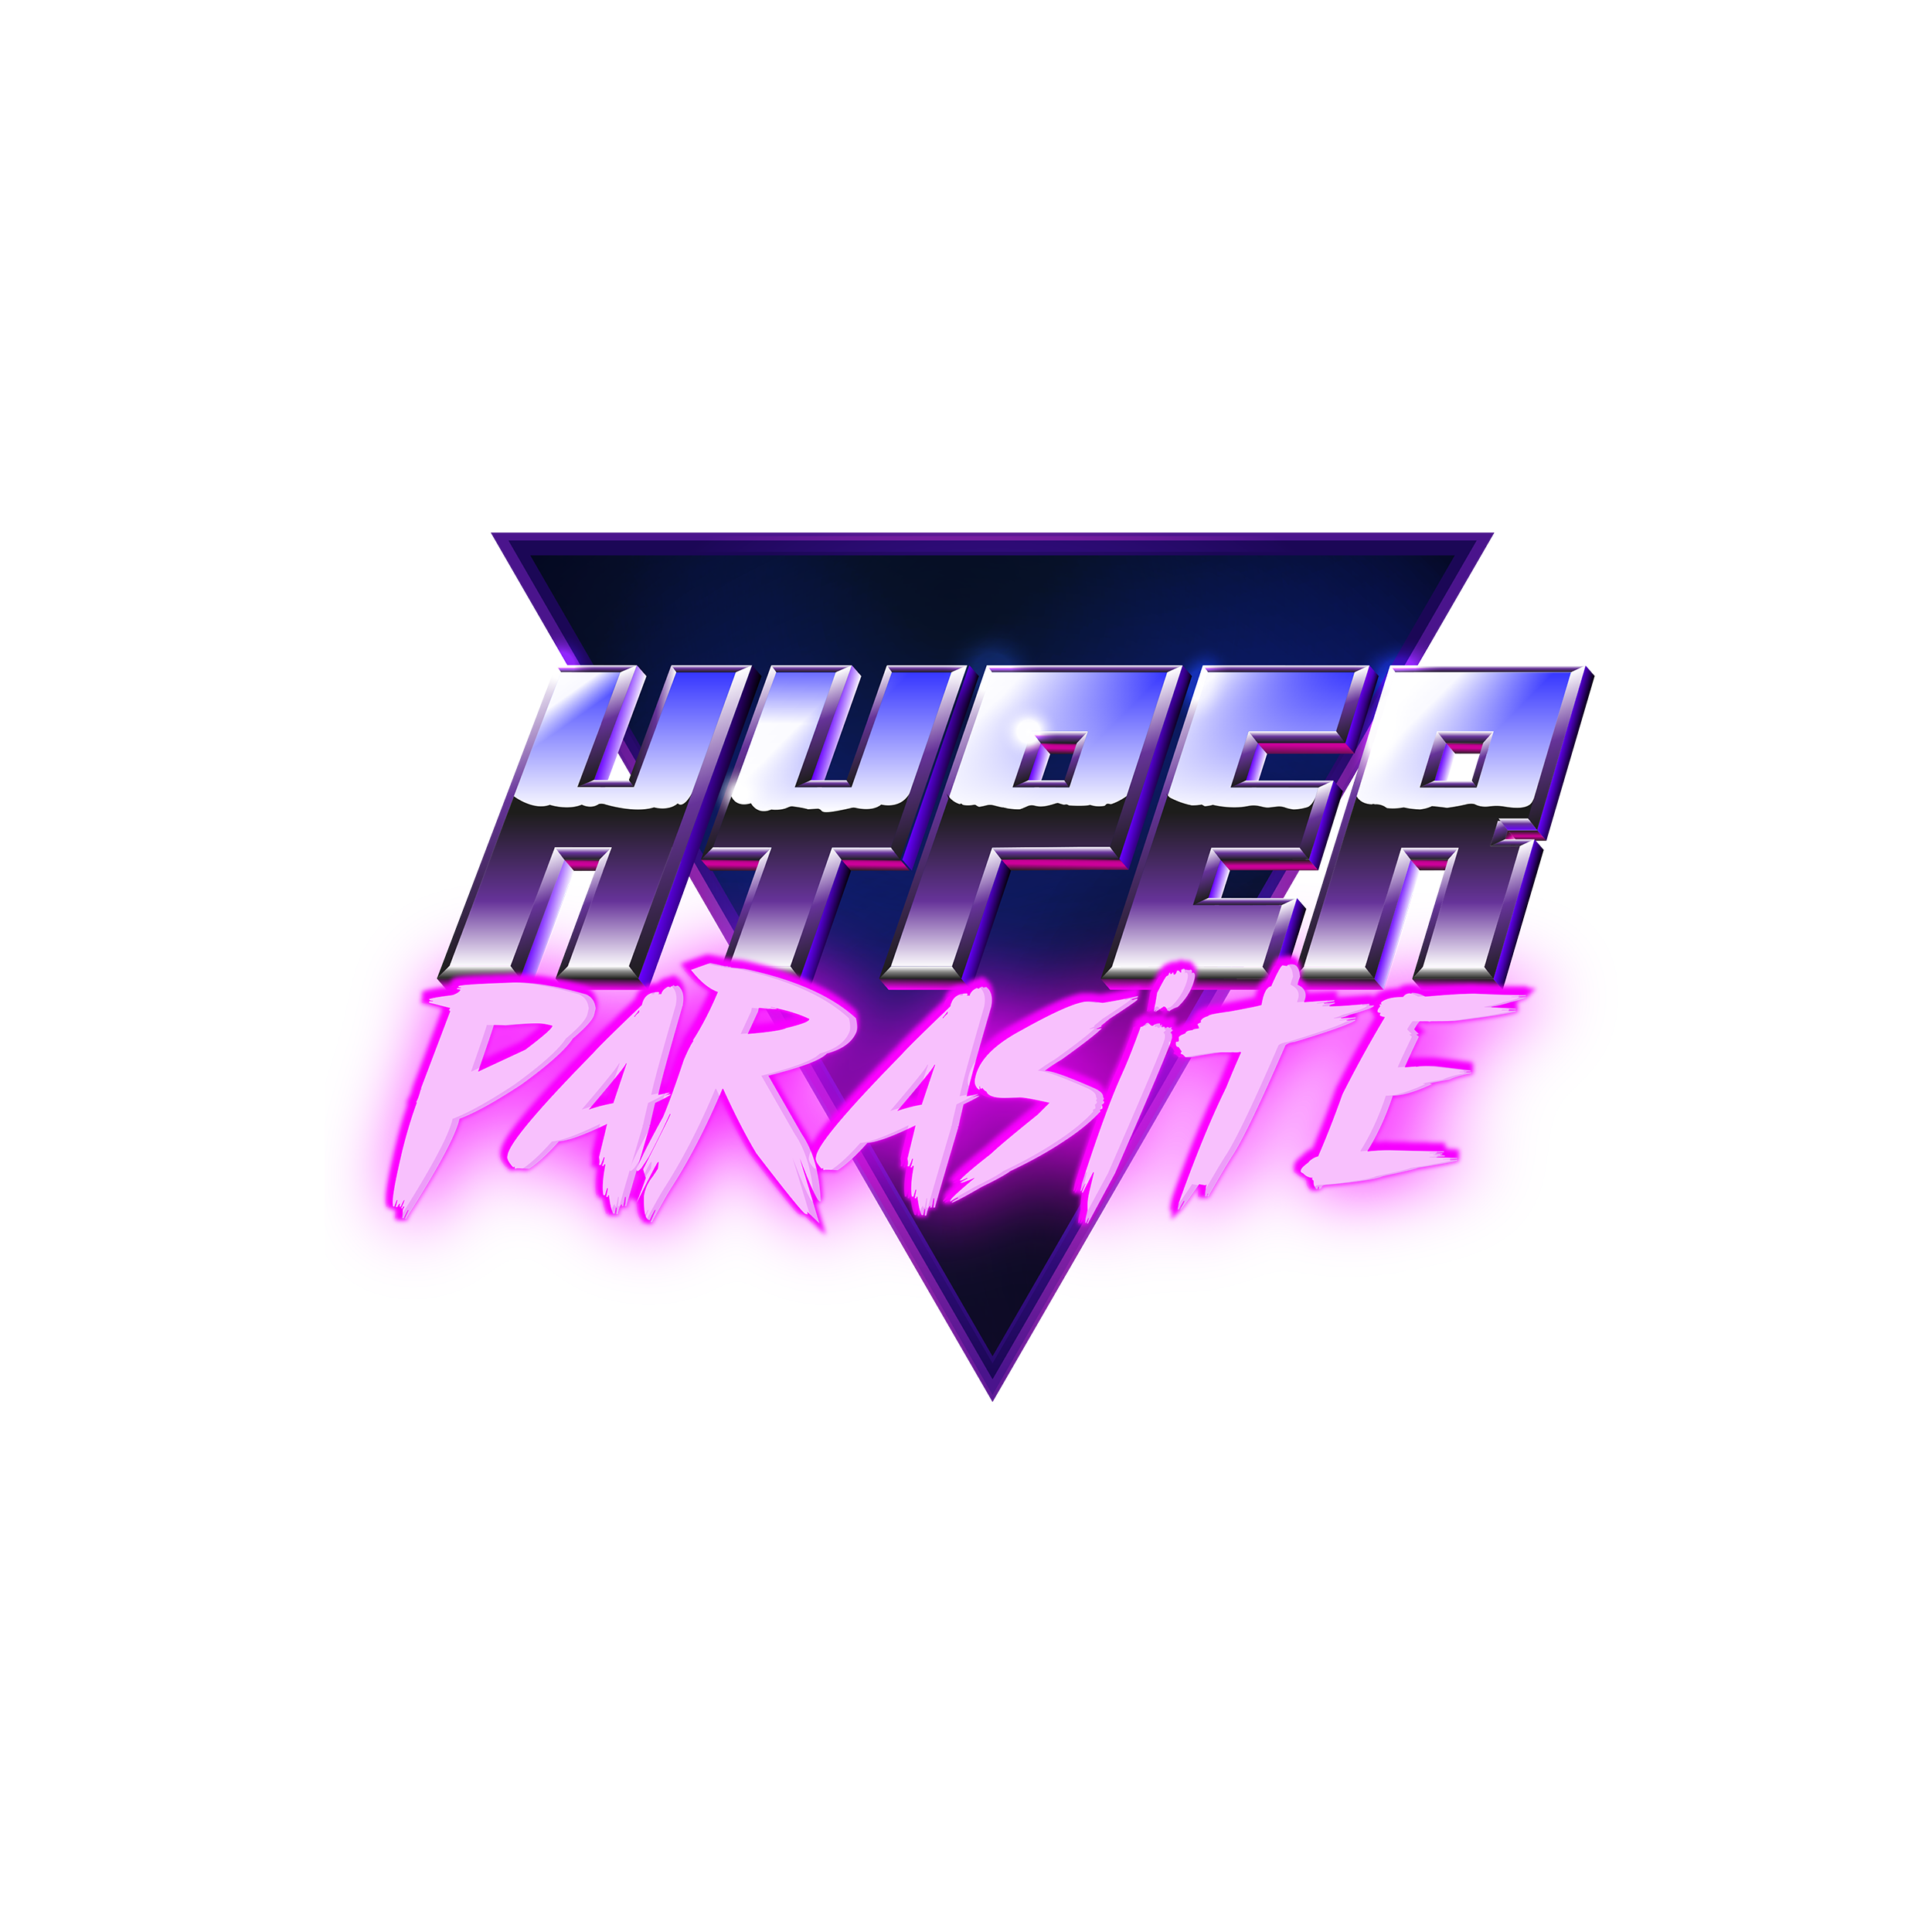 HyperParasite logo